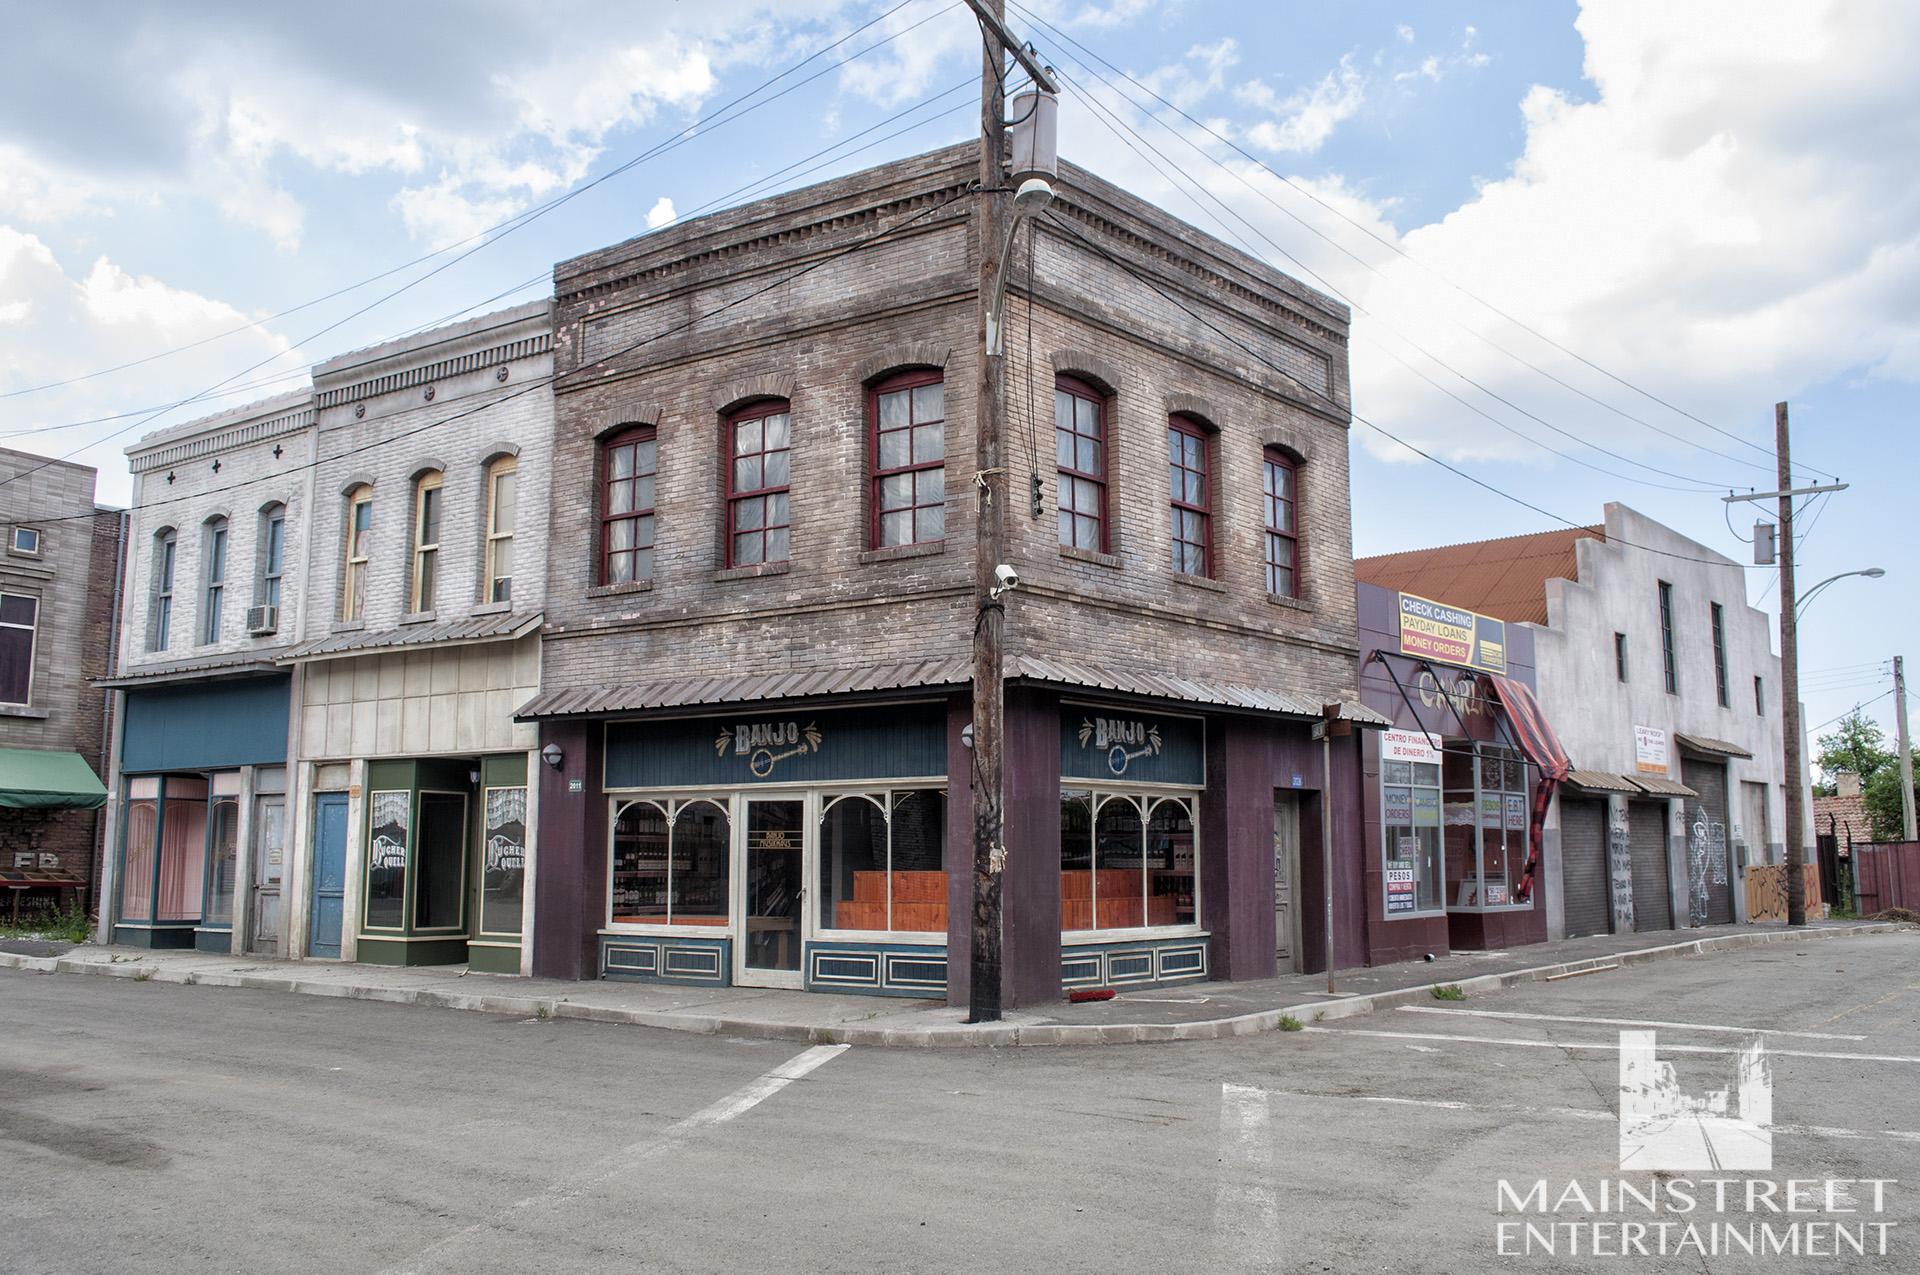 southern american town film set